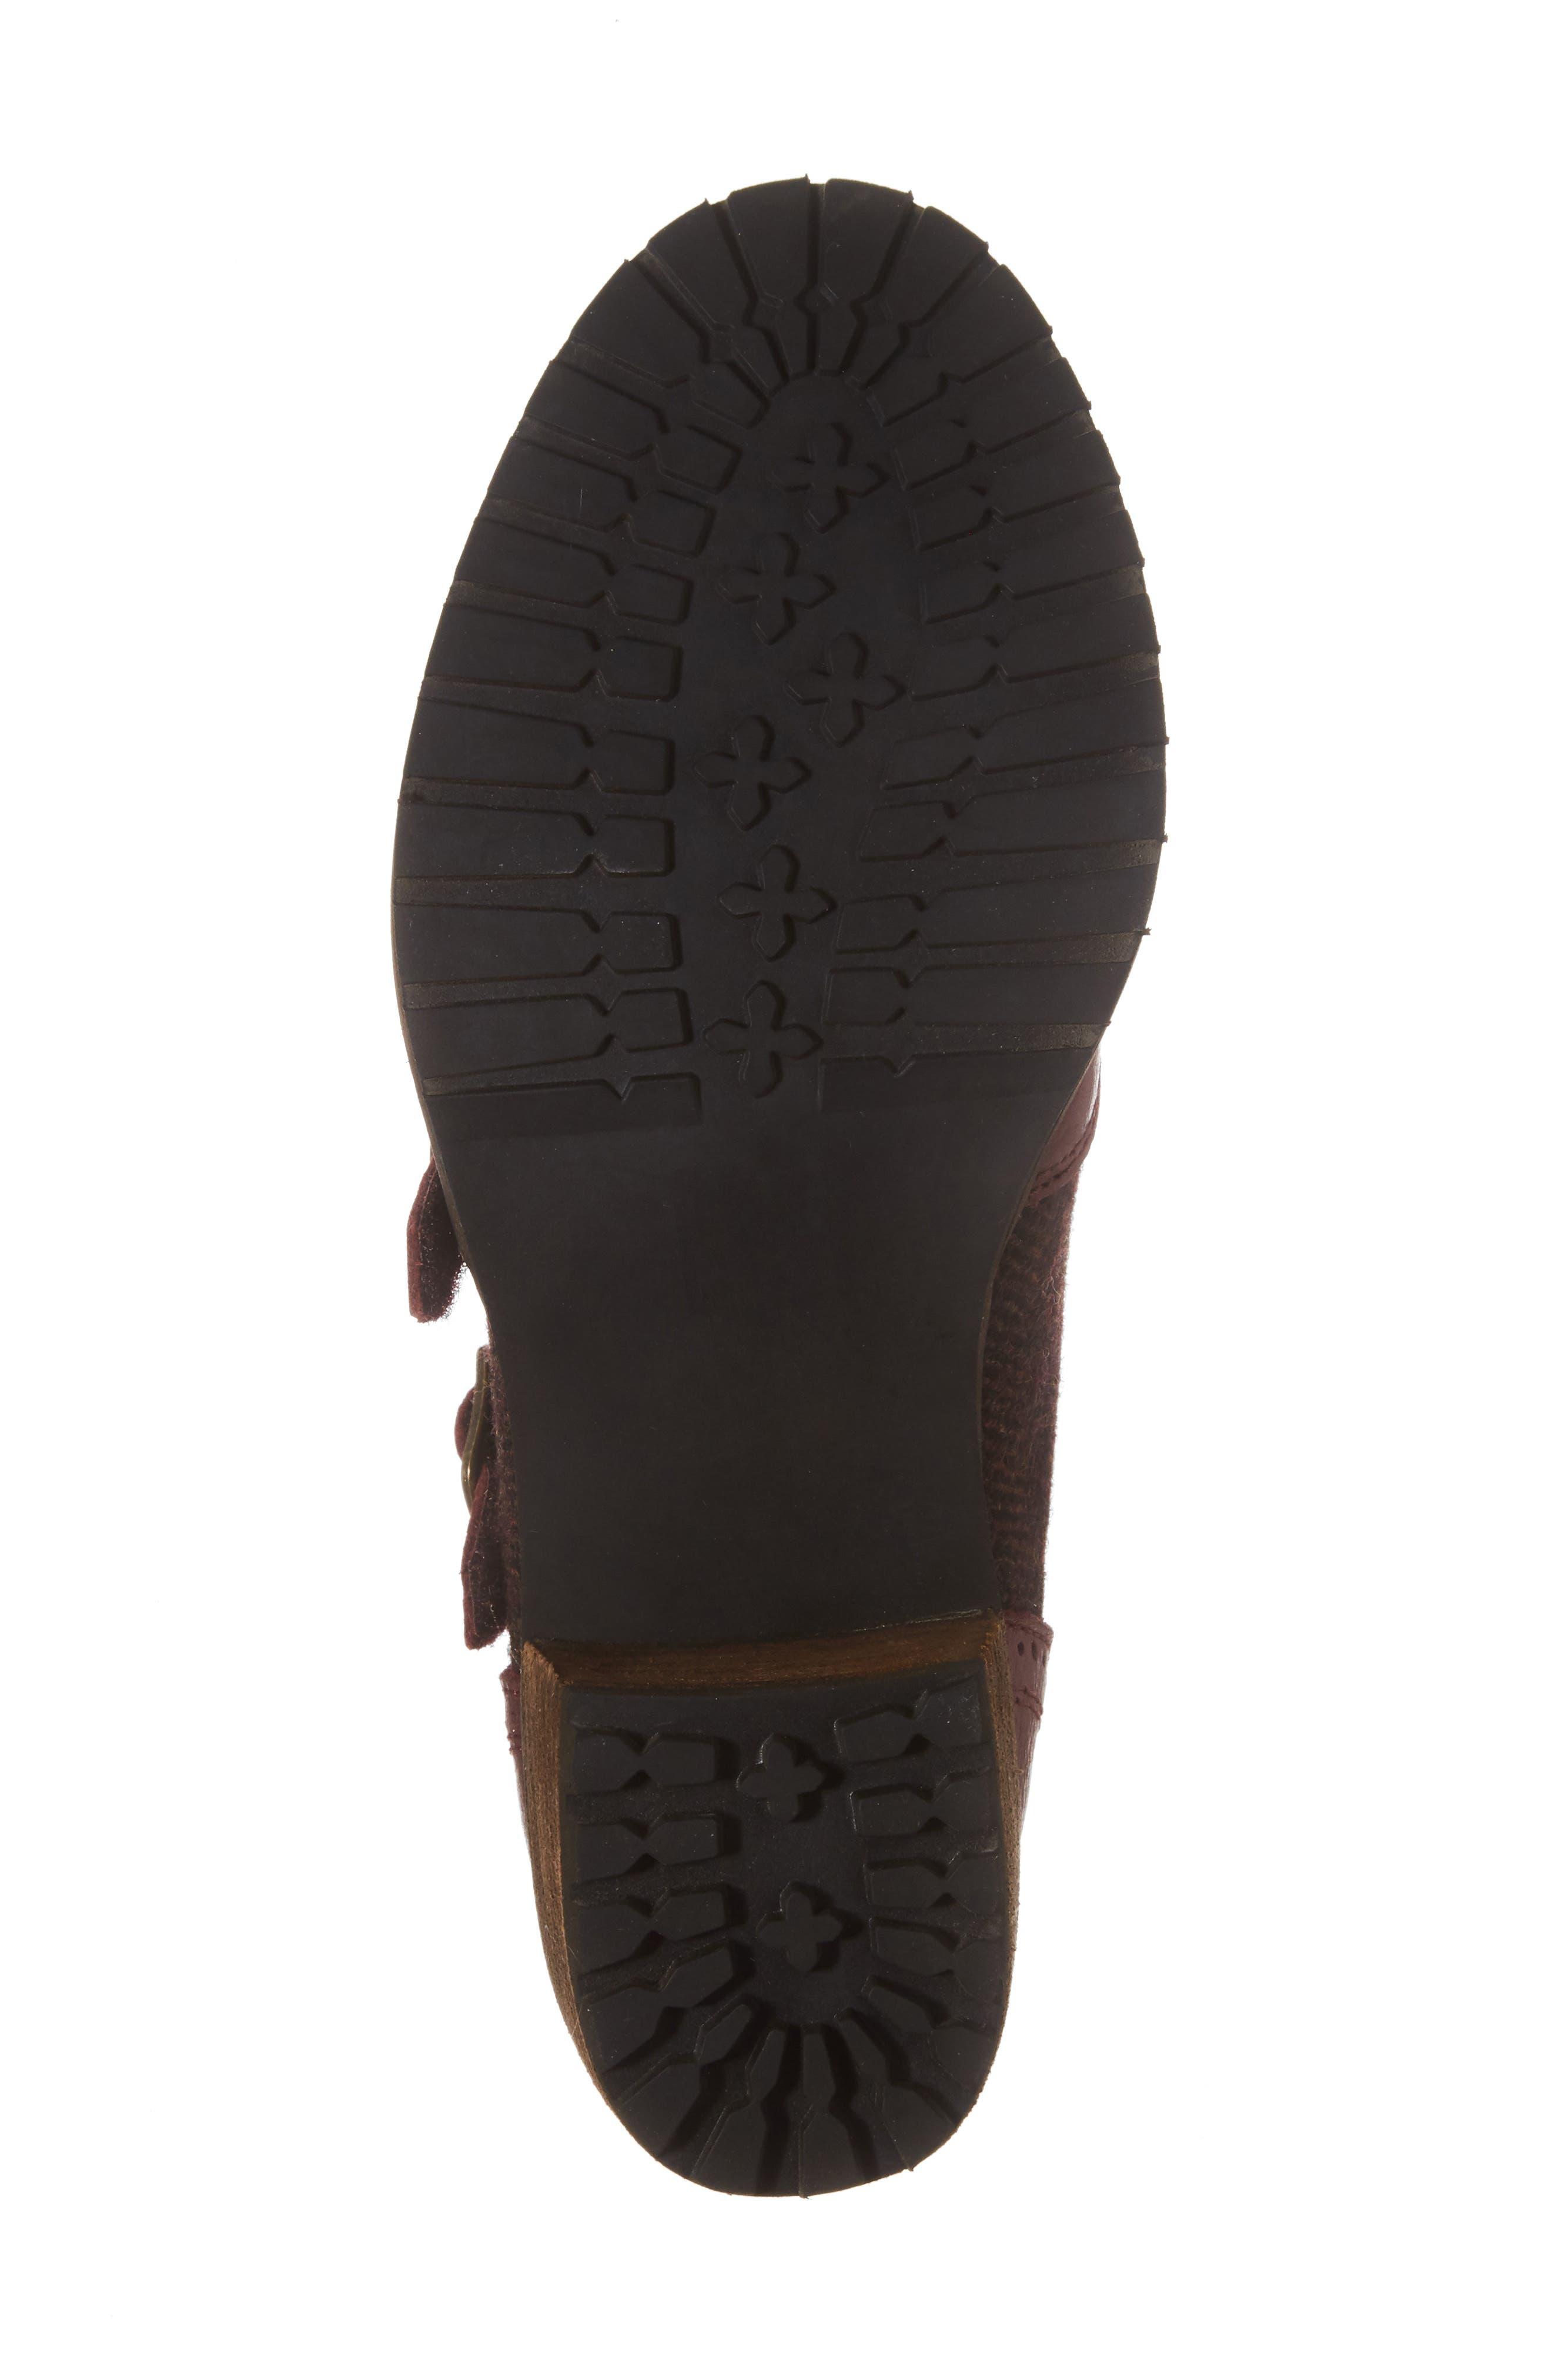 Dina Double Monk Strap Ankle Boot,                             Alternate thumbnail 6, color,                             Merlot Leather